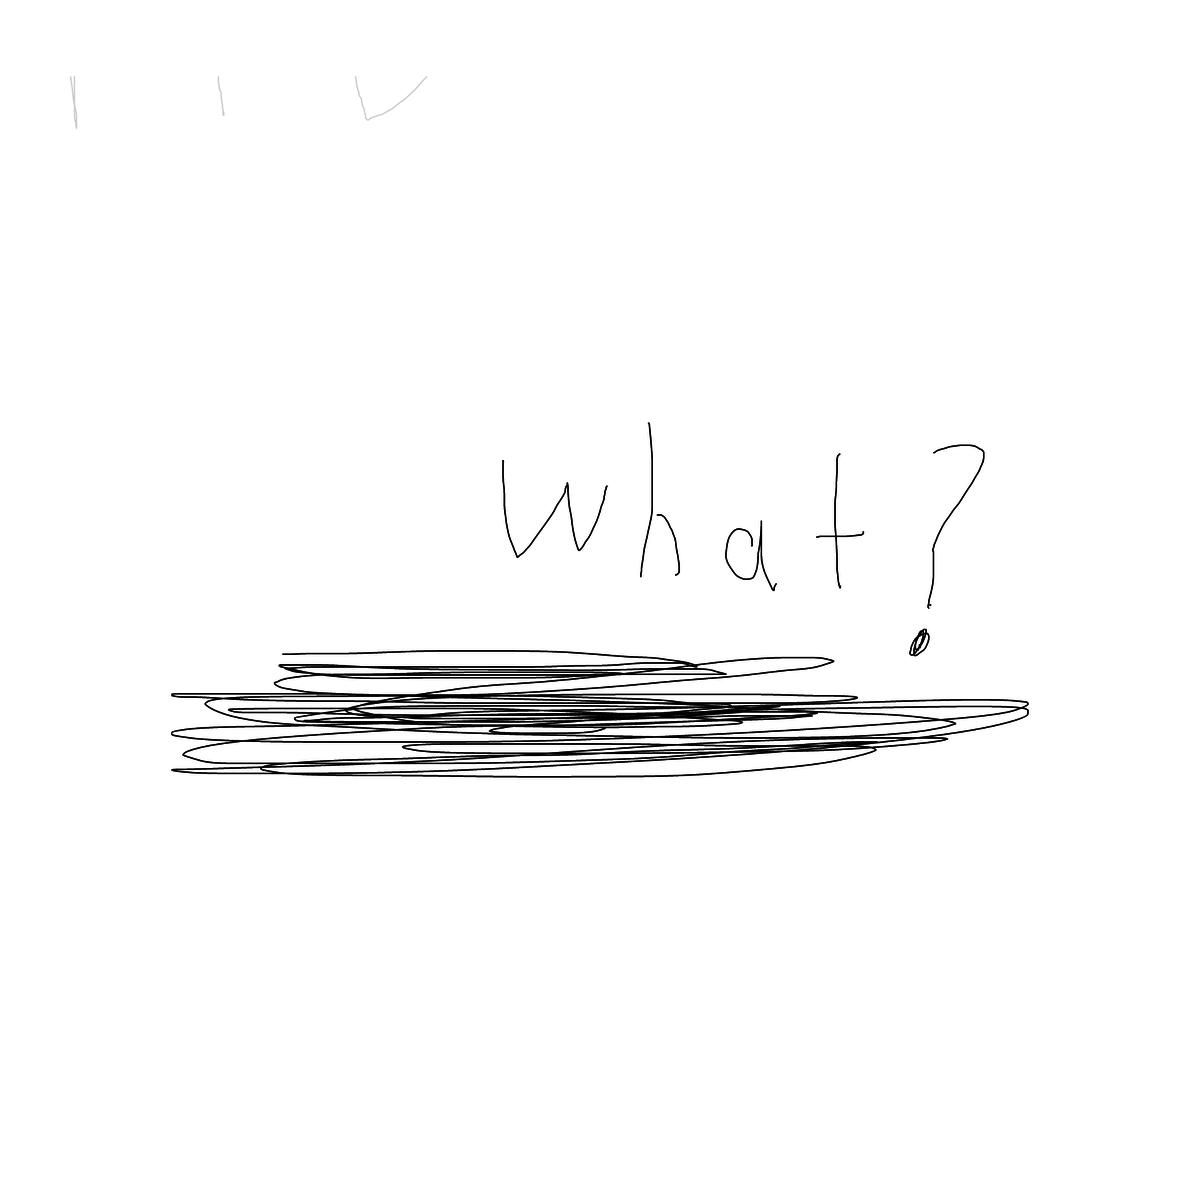 BAAAM drawing#22956 lat:51.9922599792480500lng: 5.8946189880371090